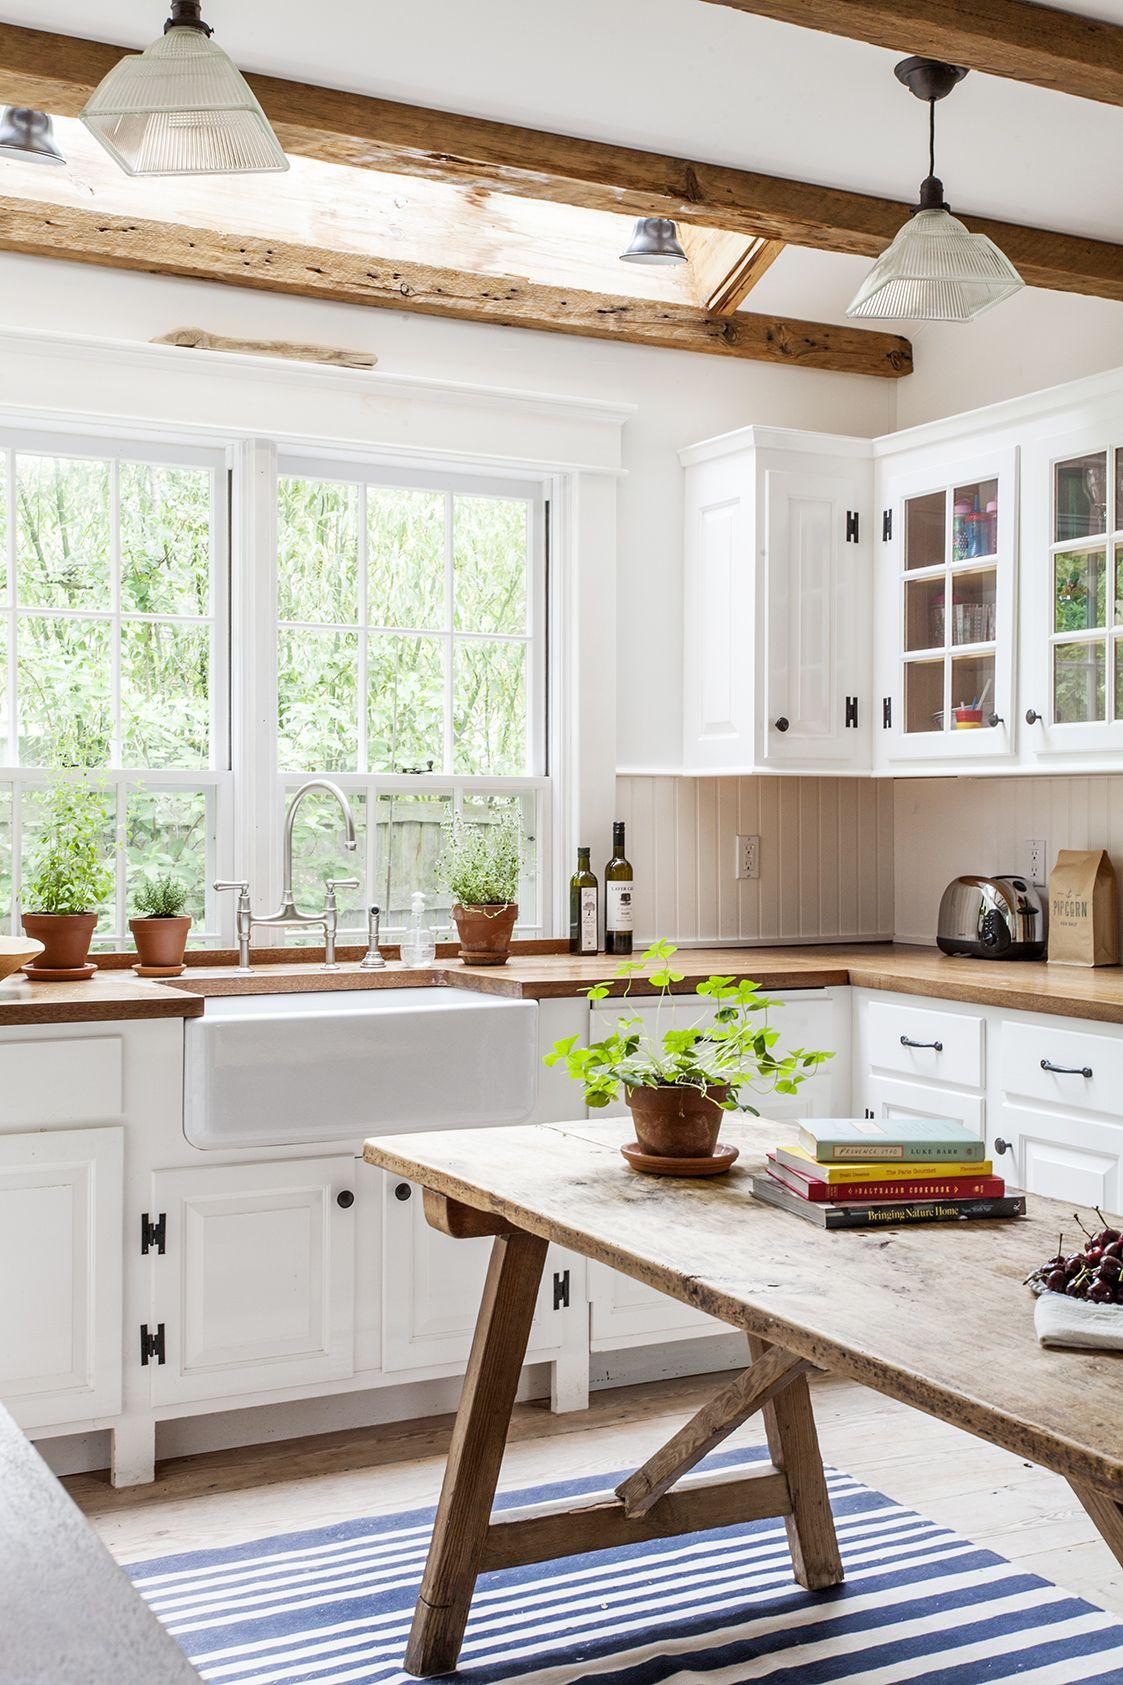 Farmhouse Kitchen Decor Ideas | Home Decorating | Pinterest ...